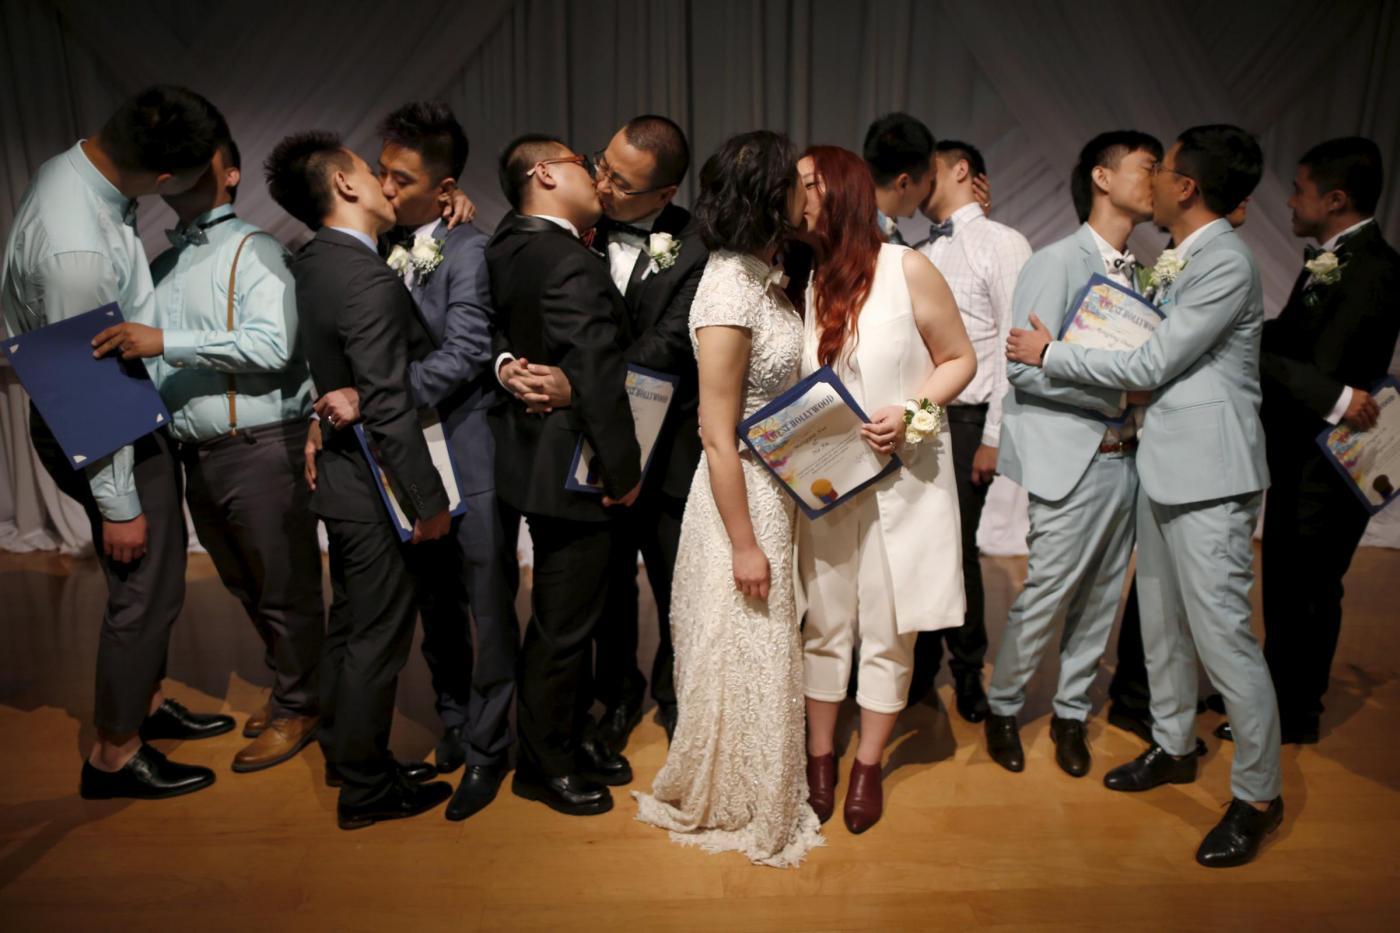 Sette coppie omosessuali cinesi si sposano a Los Angeles20